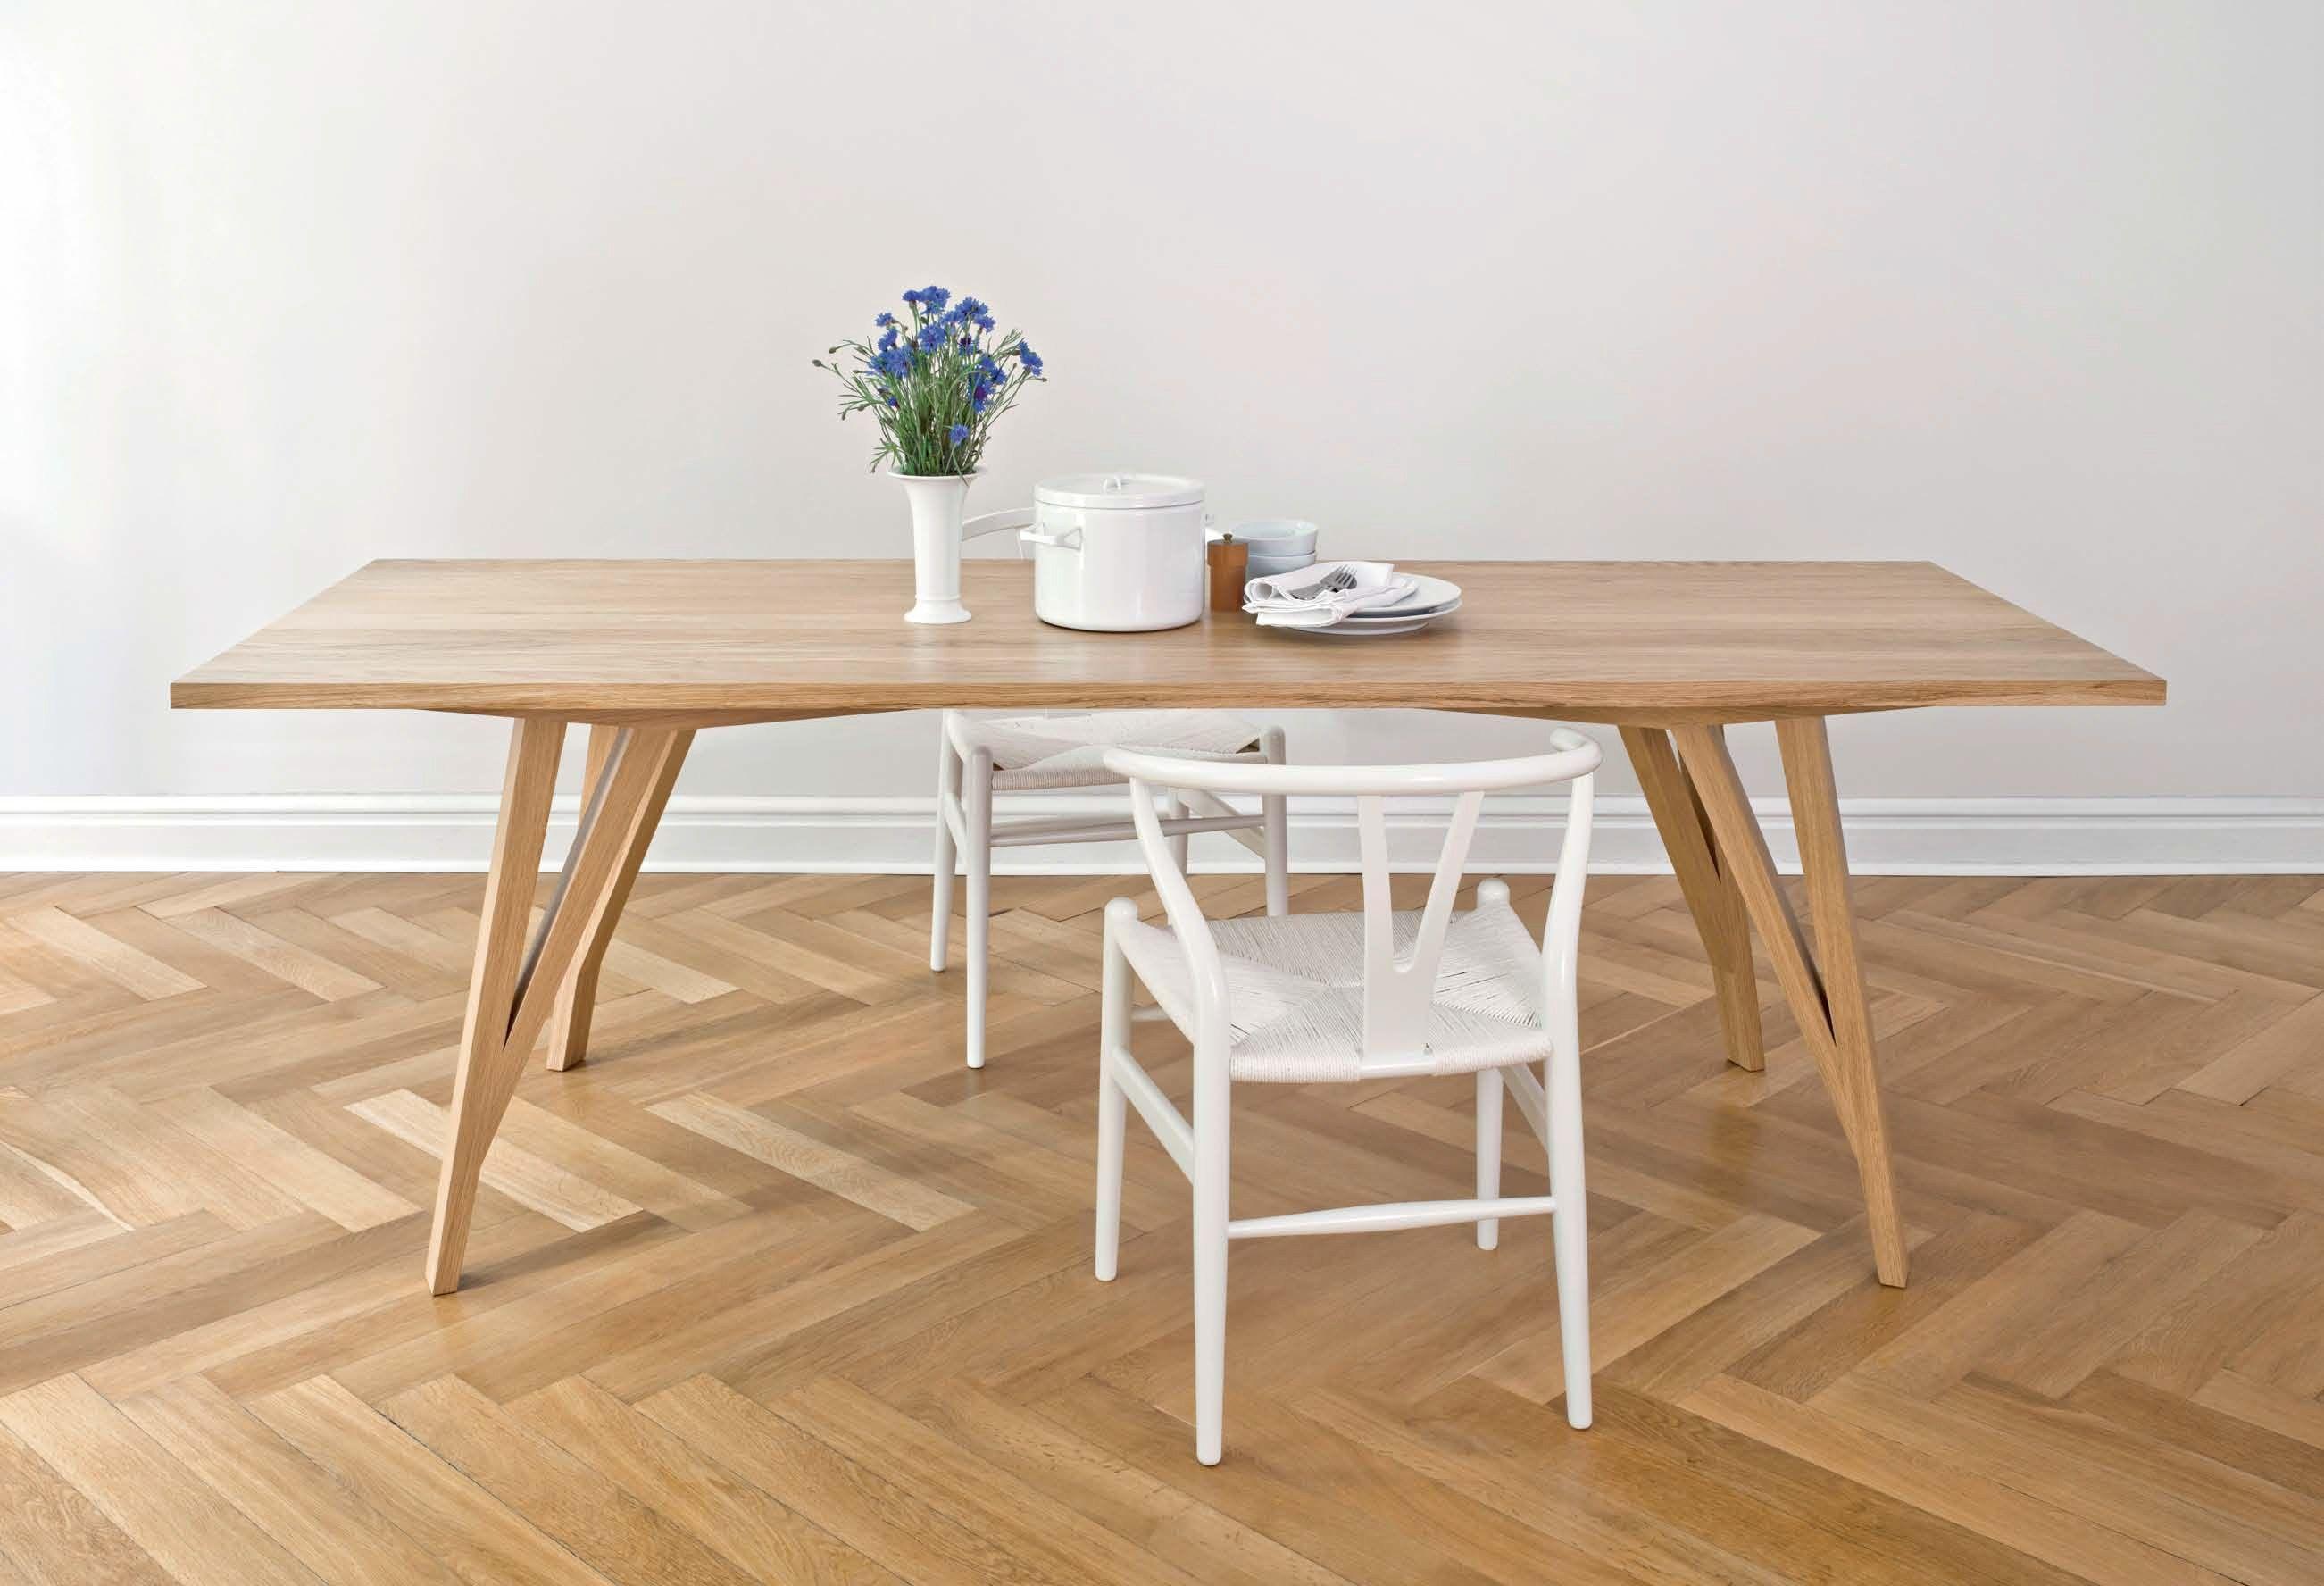 jl5 table en bois next home pinterest en bois table et collection. Black Bedroom Furniture Sets. Home Design Ideas